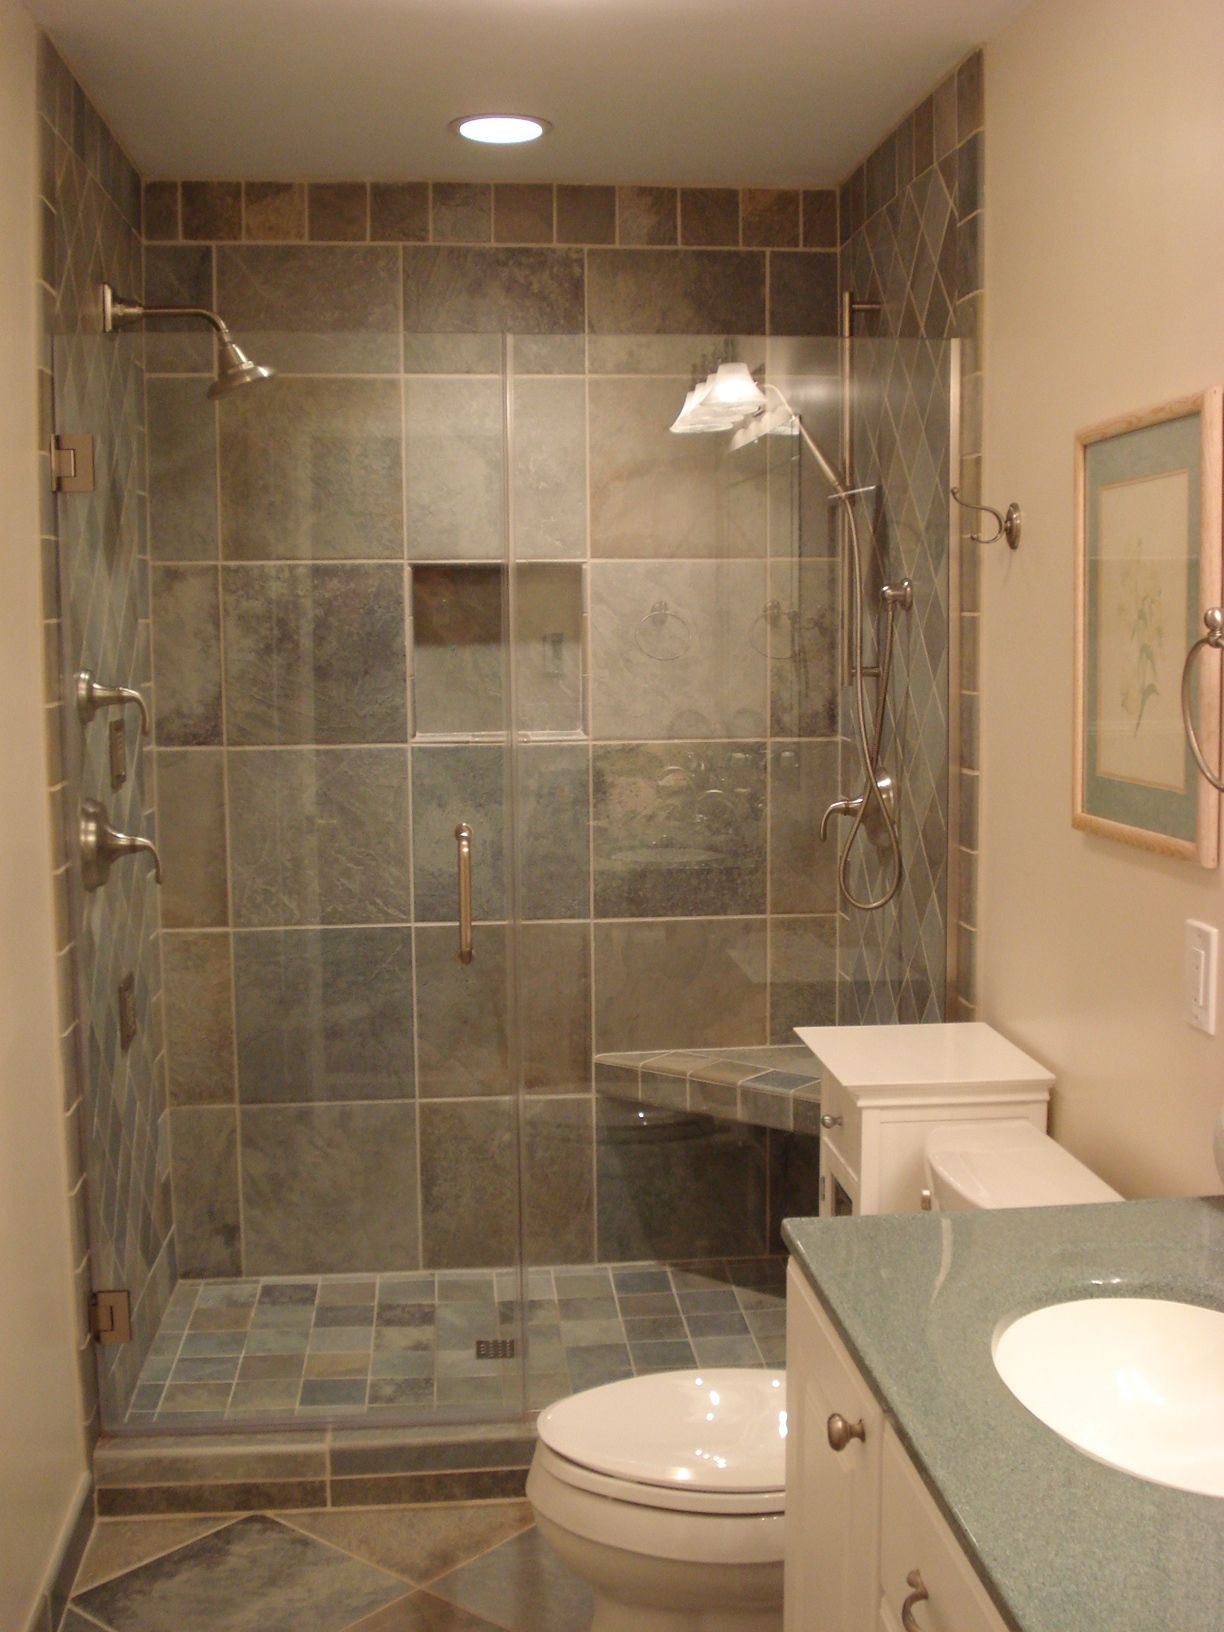 Bathroom Bathroom Remodels Granite Countertops Single Sink Brushed Nickel Faucet For Gra Bathroom Remodel Shower Small Bathroom Makeover Bathroom Remodel Cost